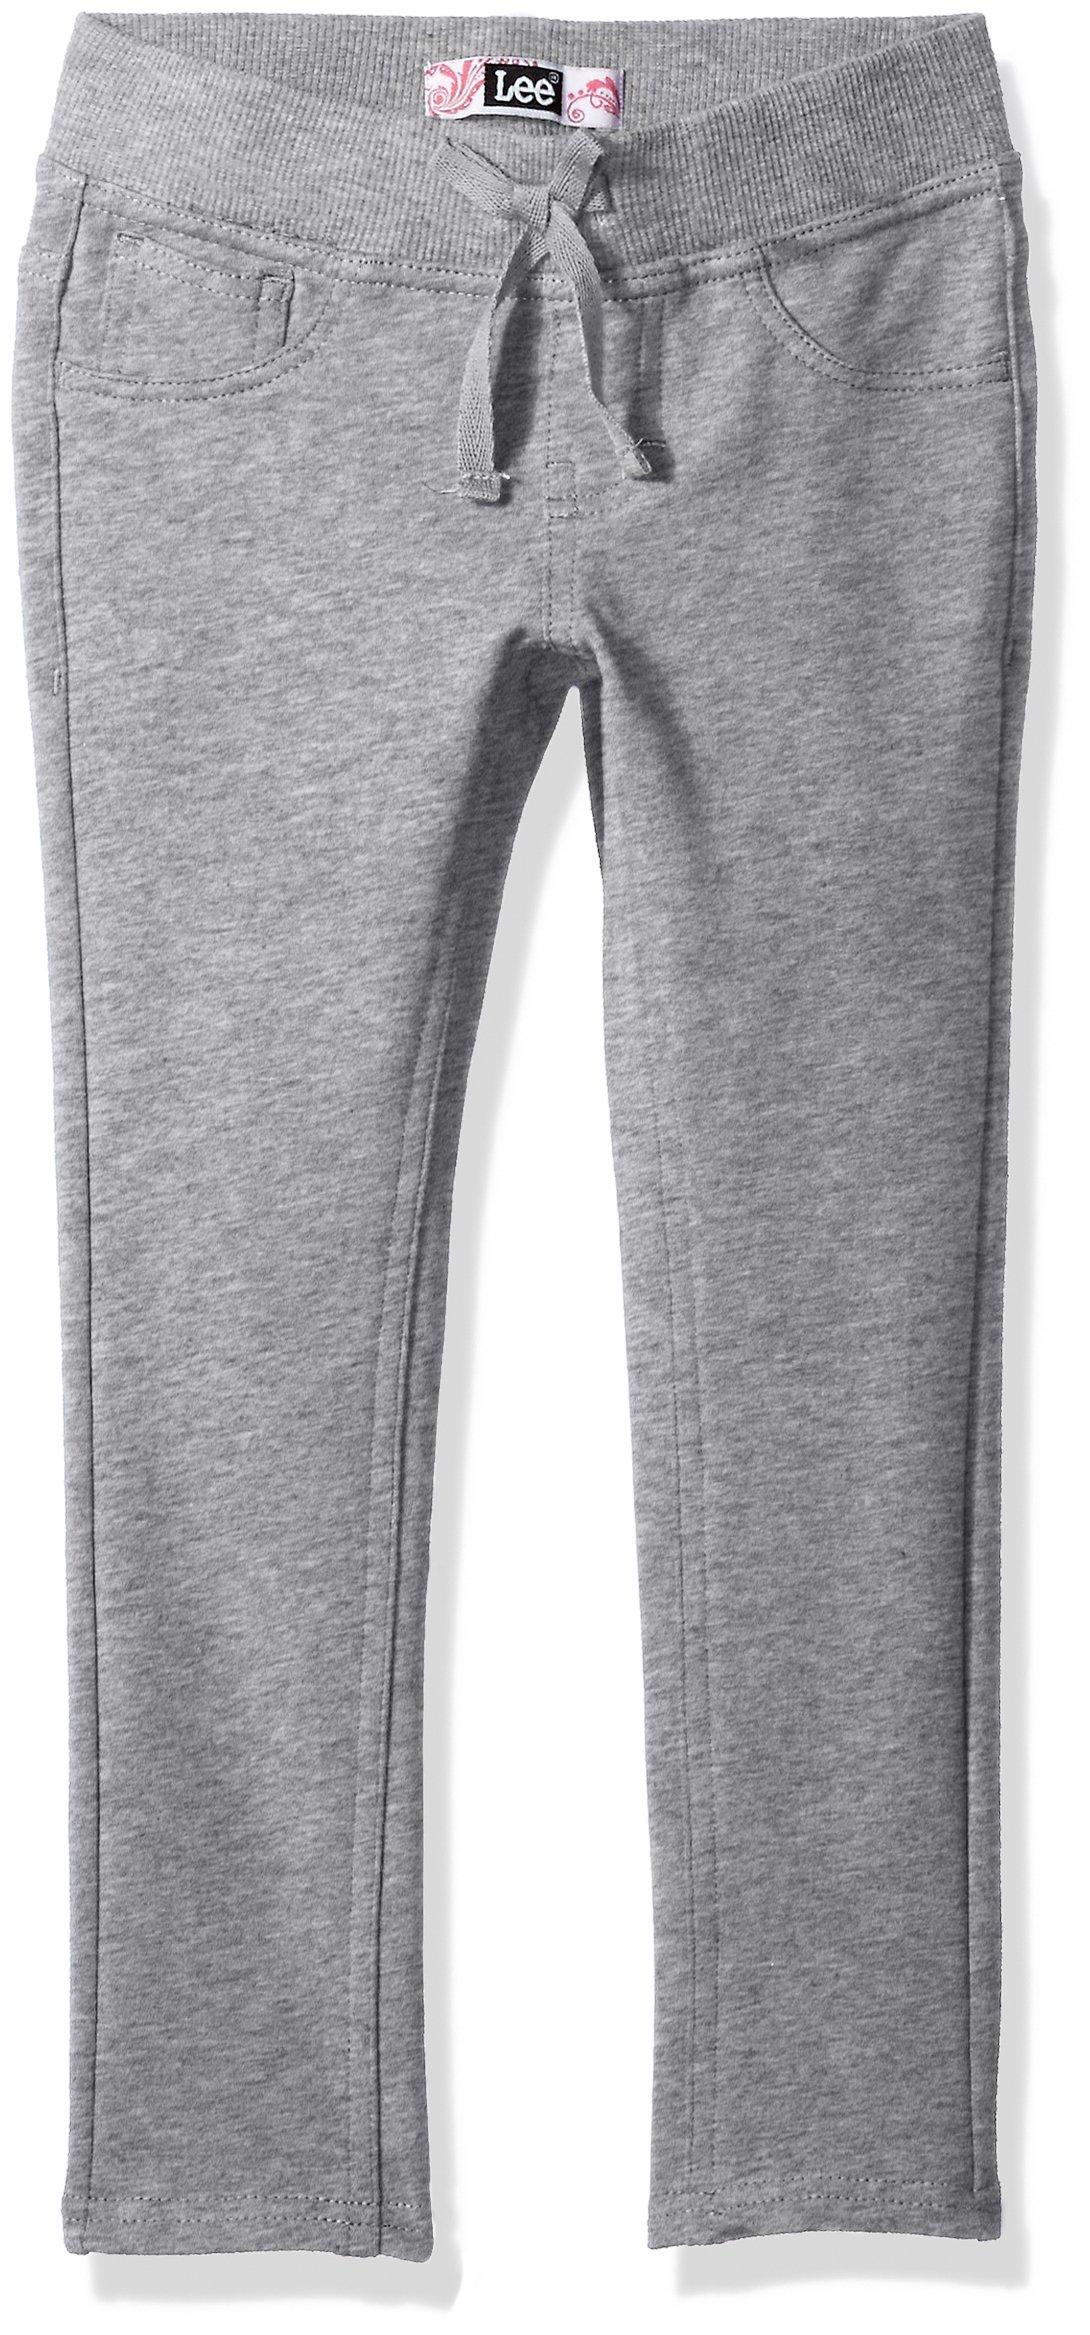 LEE Little Girls' Knit Waist Skinny Pull on Pant, Heather Grey, 4